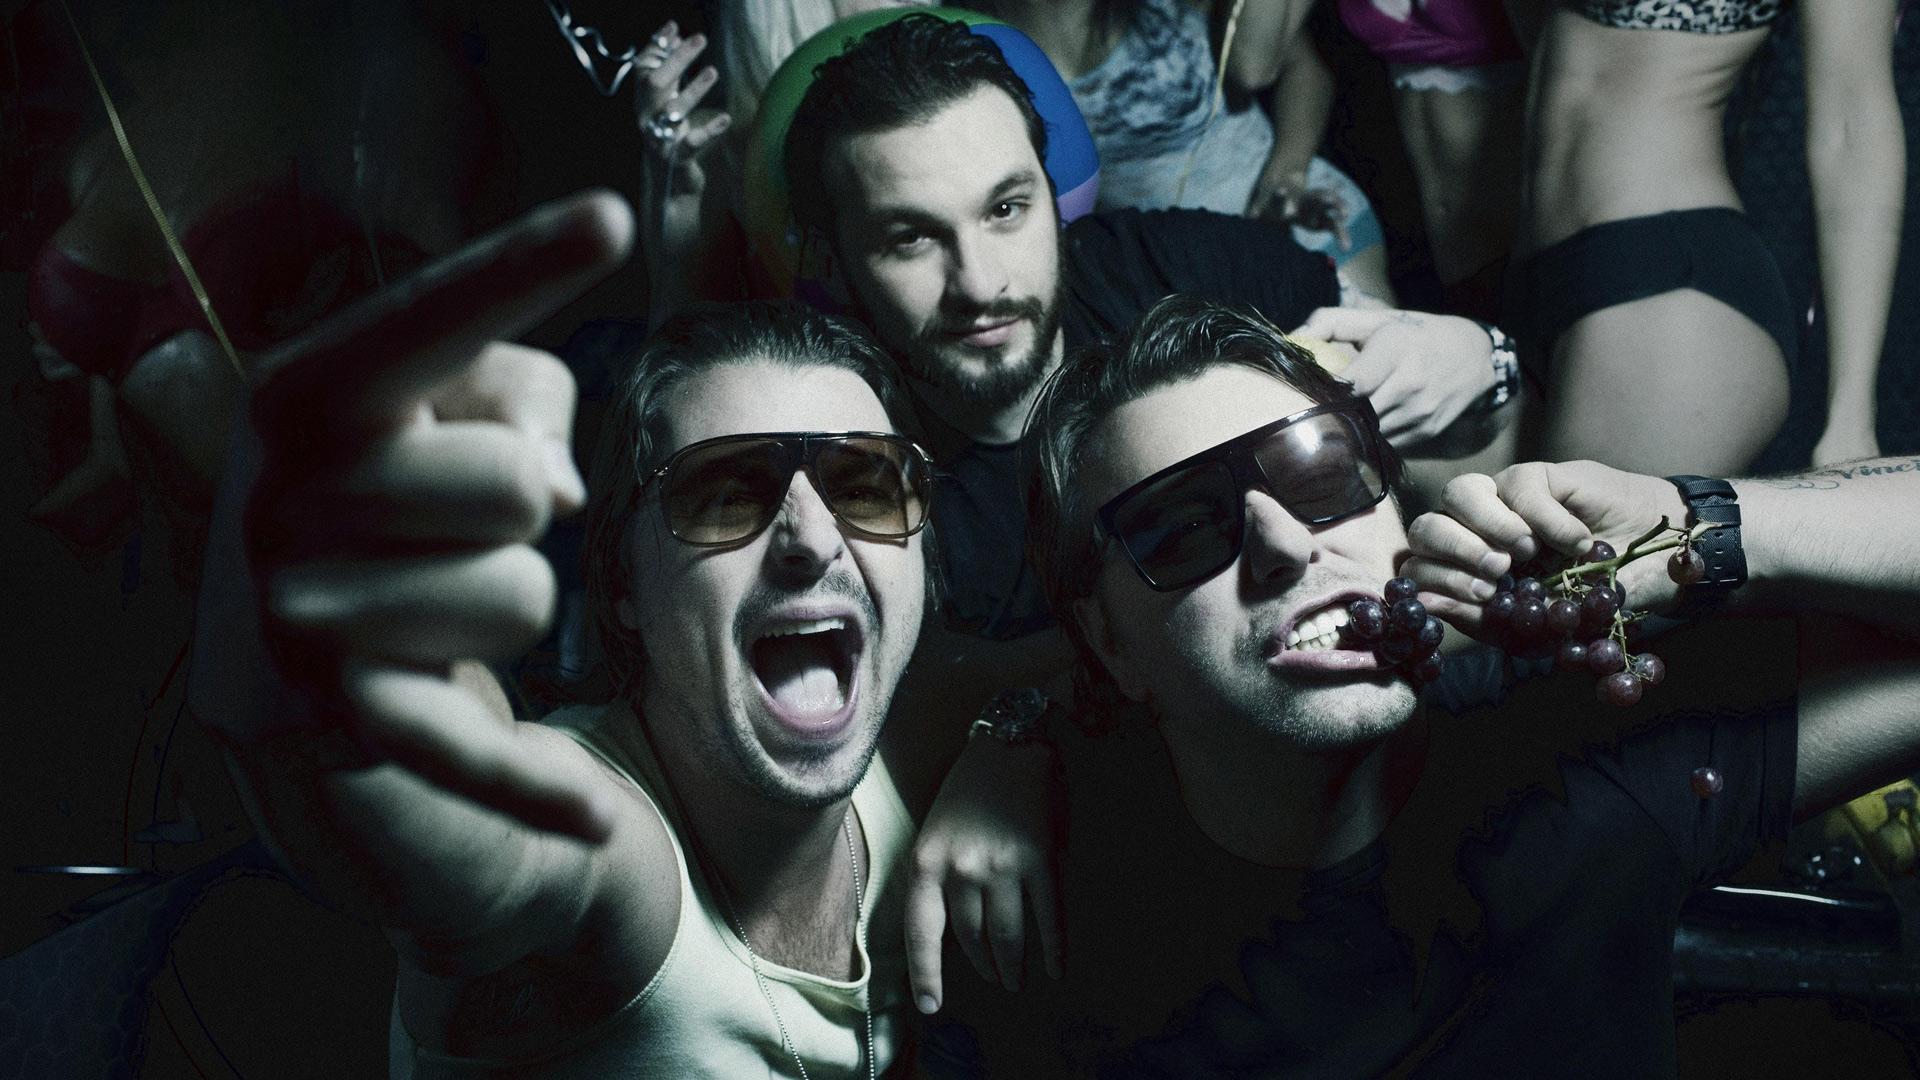 Don't You Worry Child av Swedish House Mafia